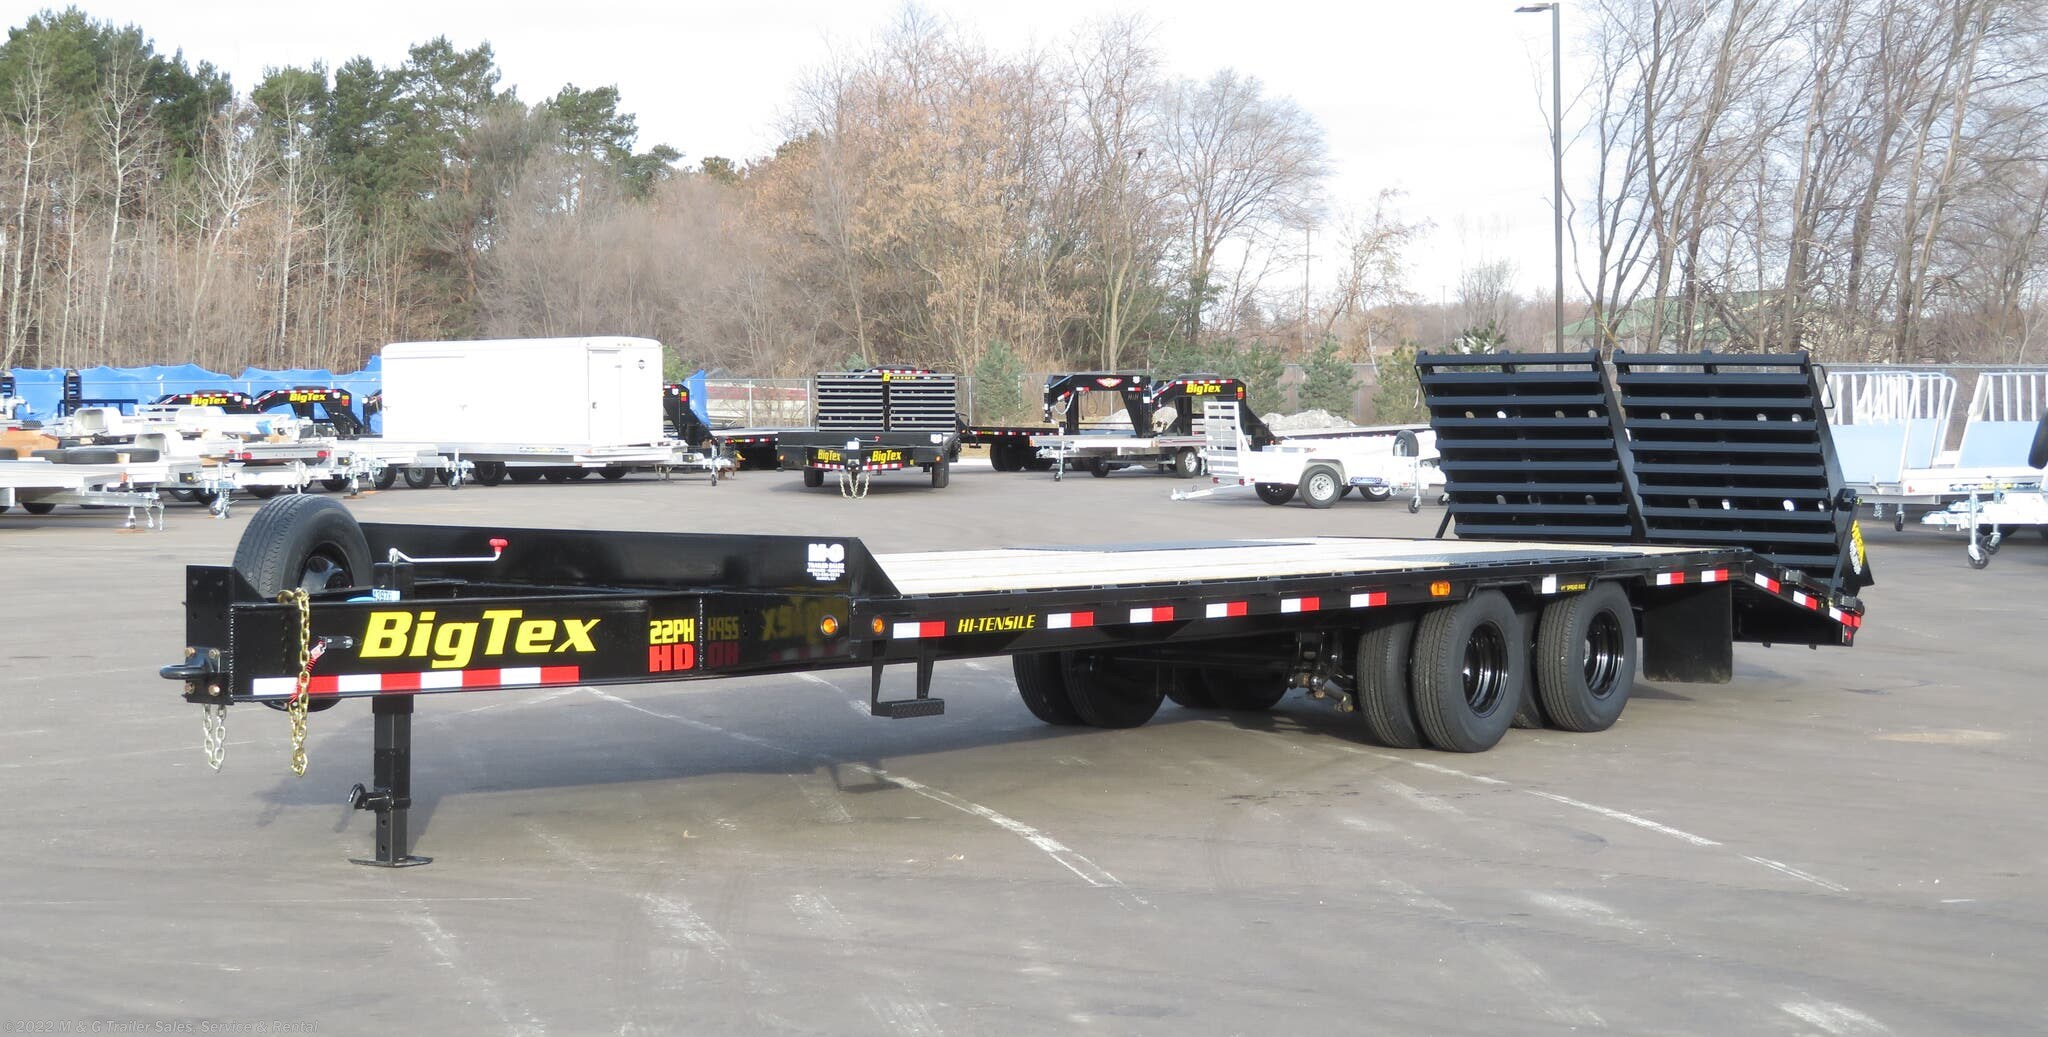 2021 Big Tex 25+5 Heavy Duty Deckover Trailer - 23.9K GVWR - Stock #043976